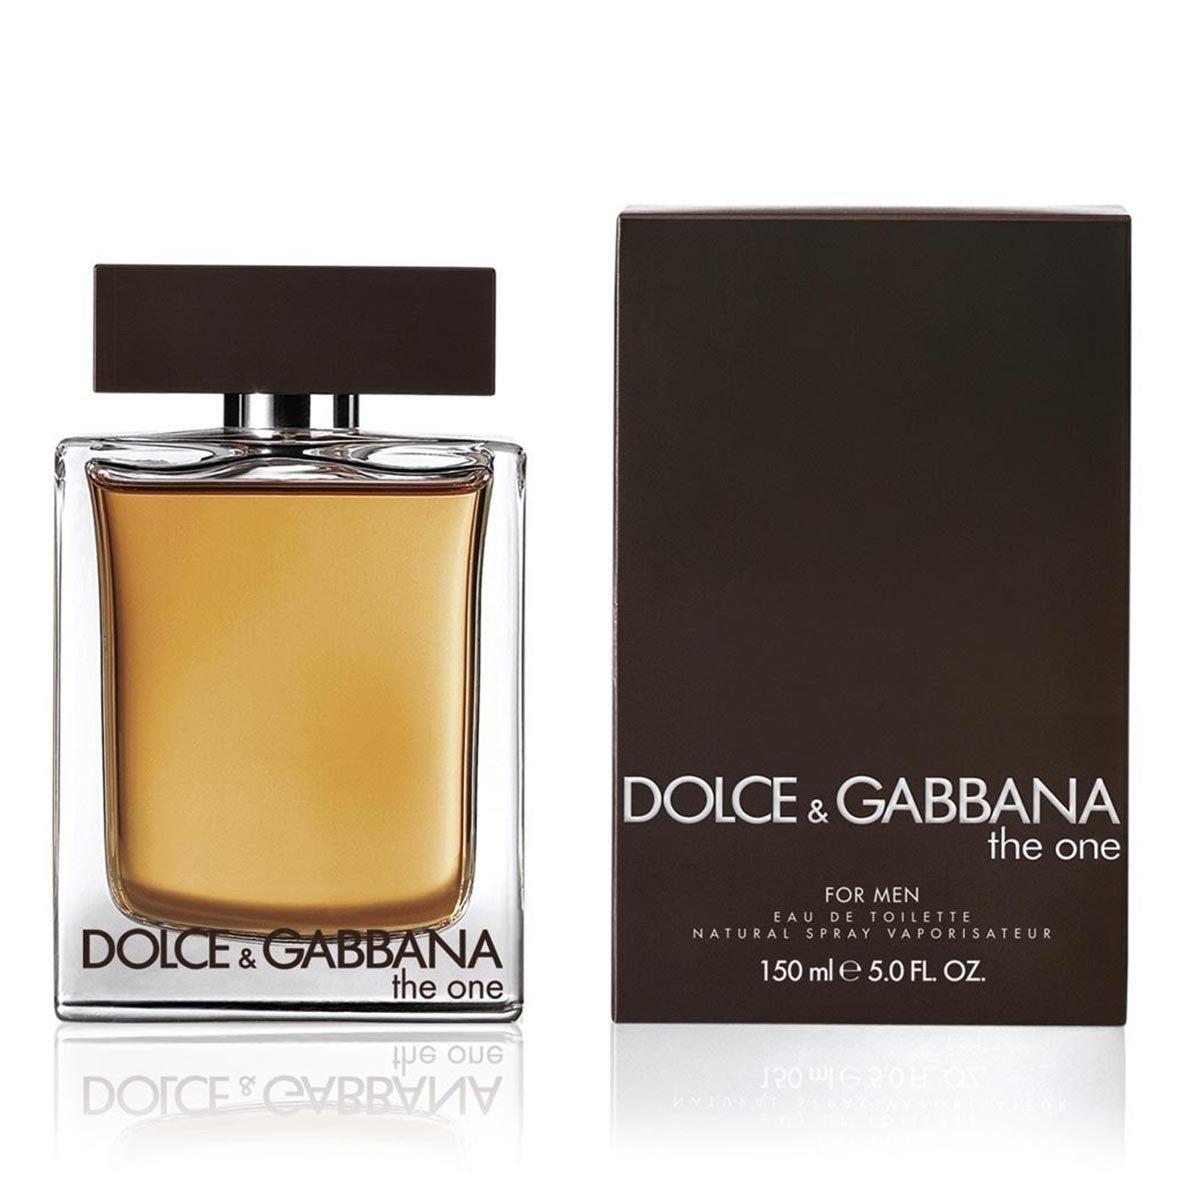 Dolce & Gabbana The One Men Agua Colonia, 150 ml